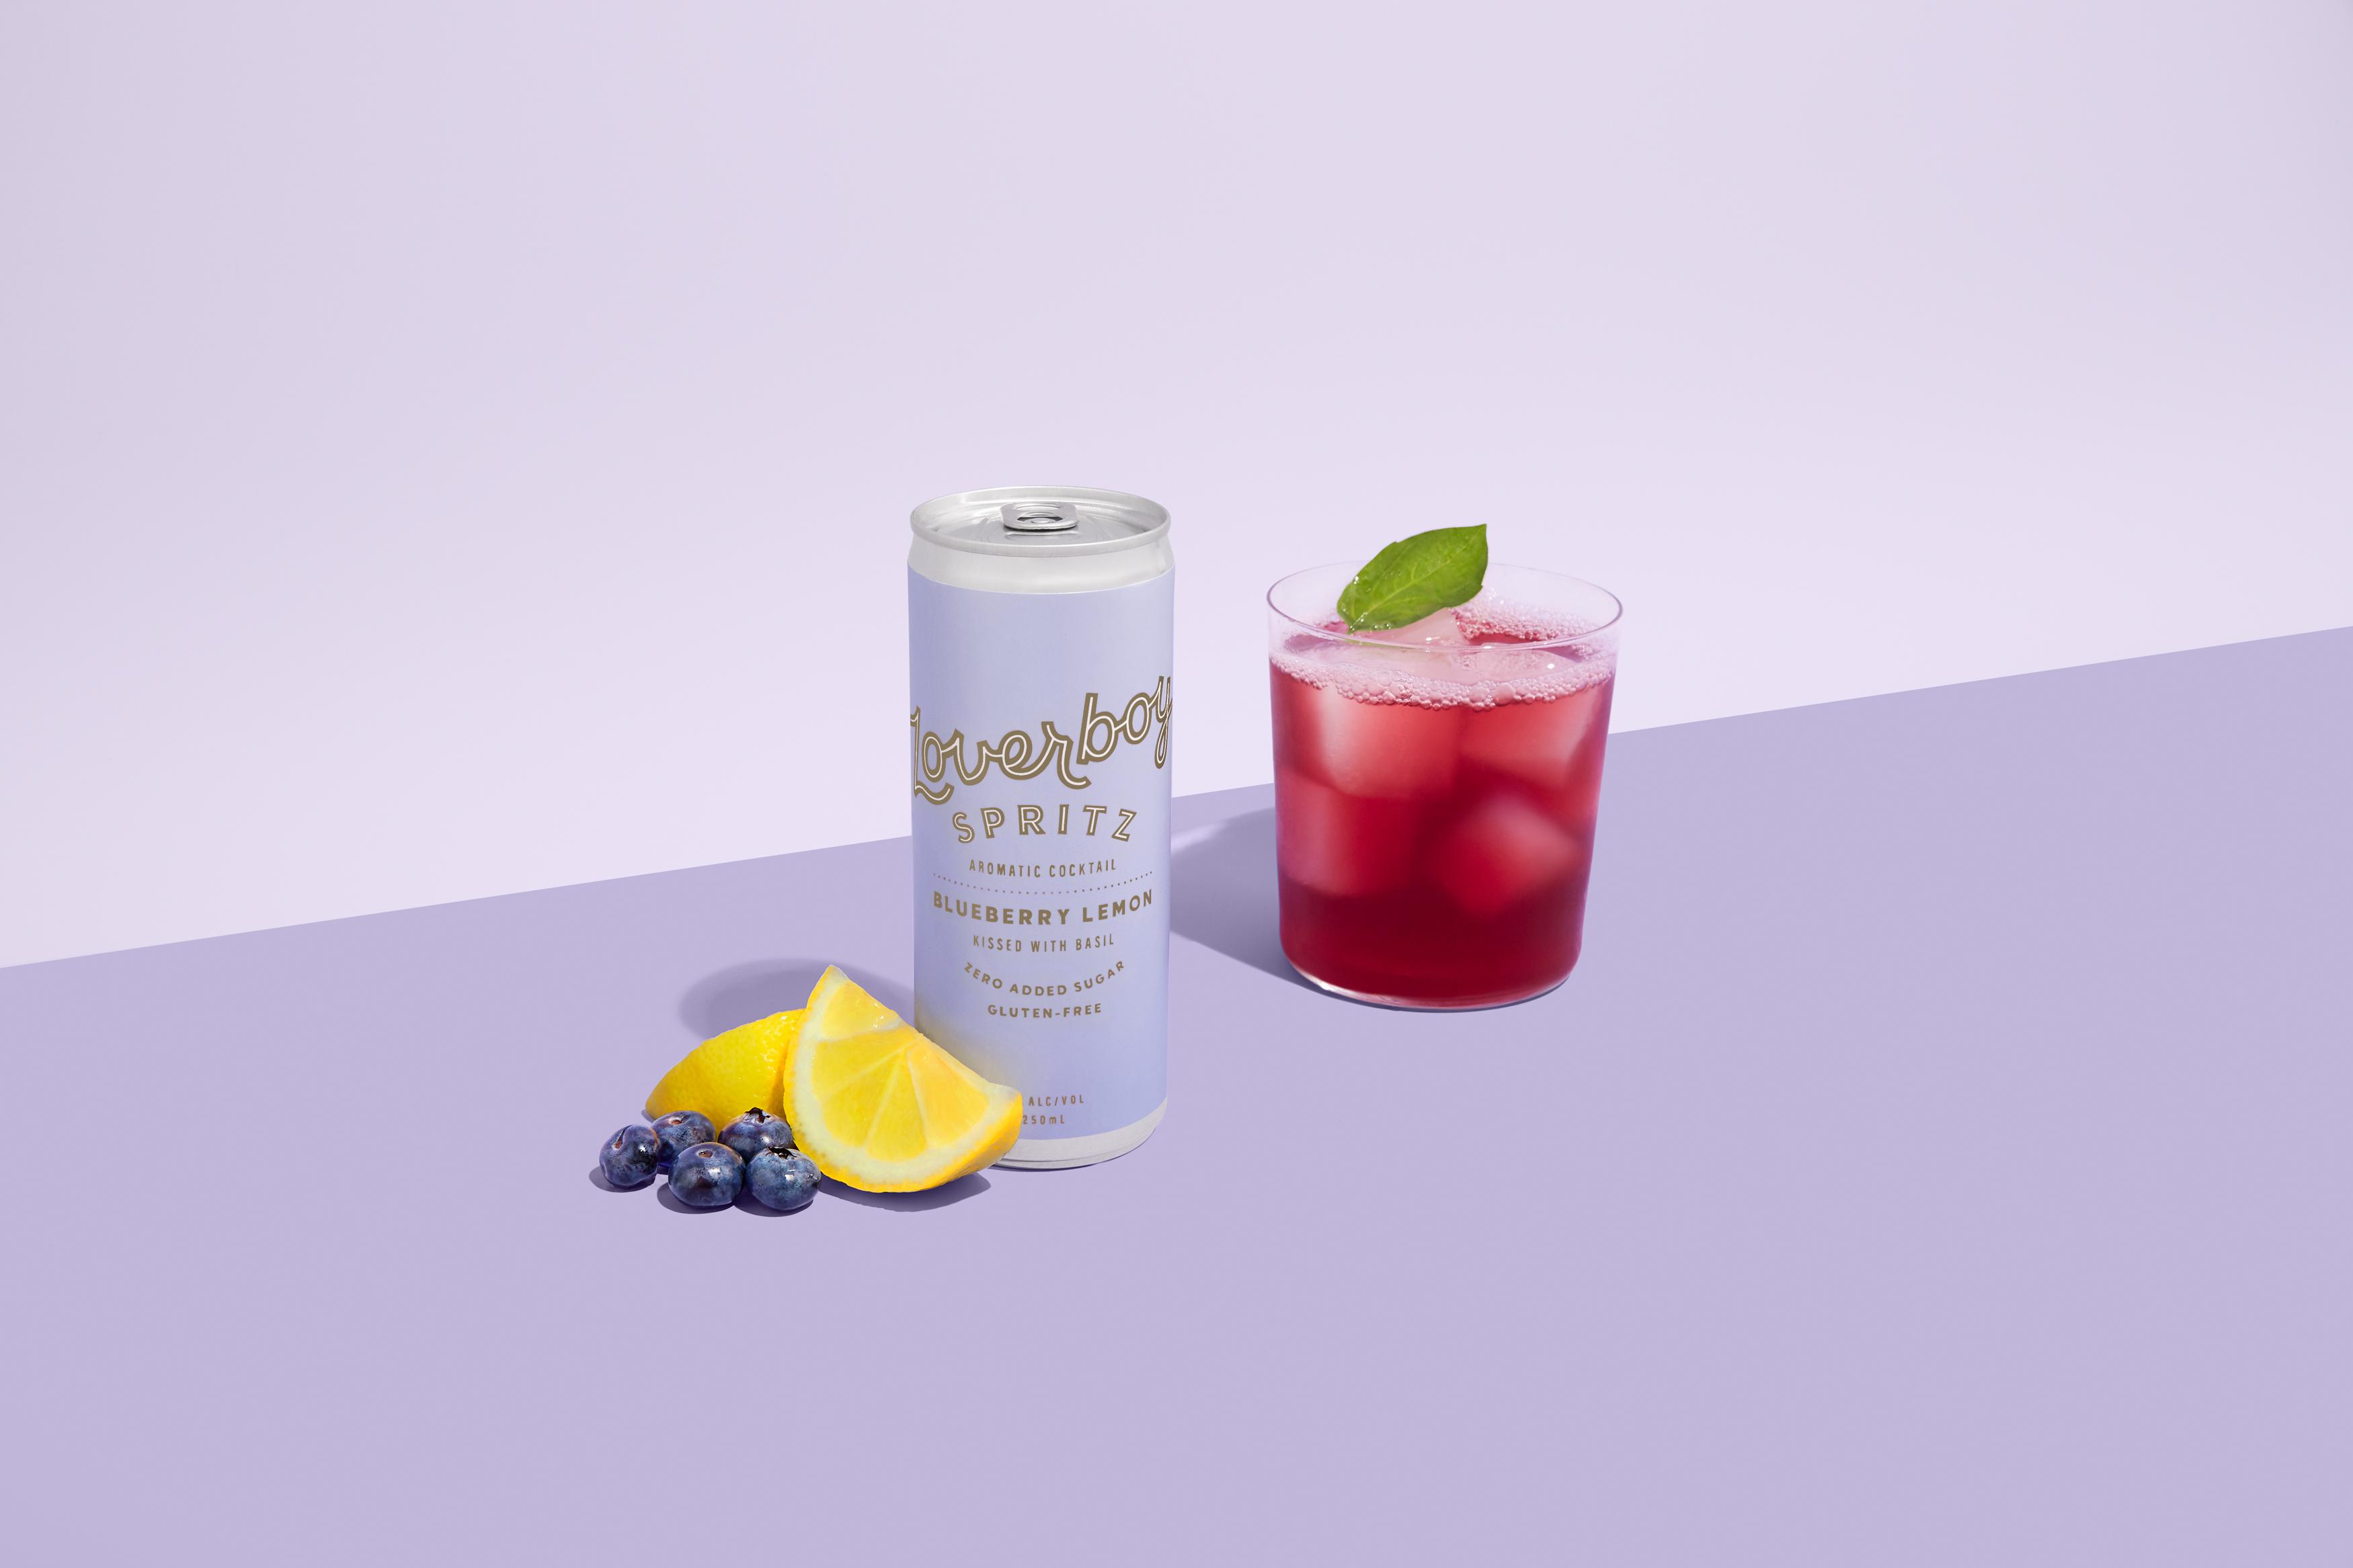 Blueberry Lemon Spritz